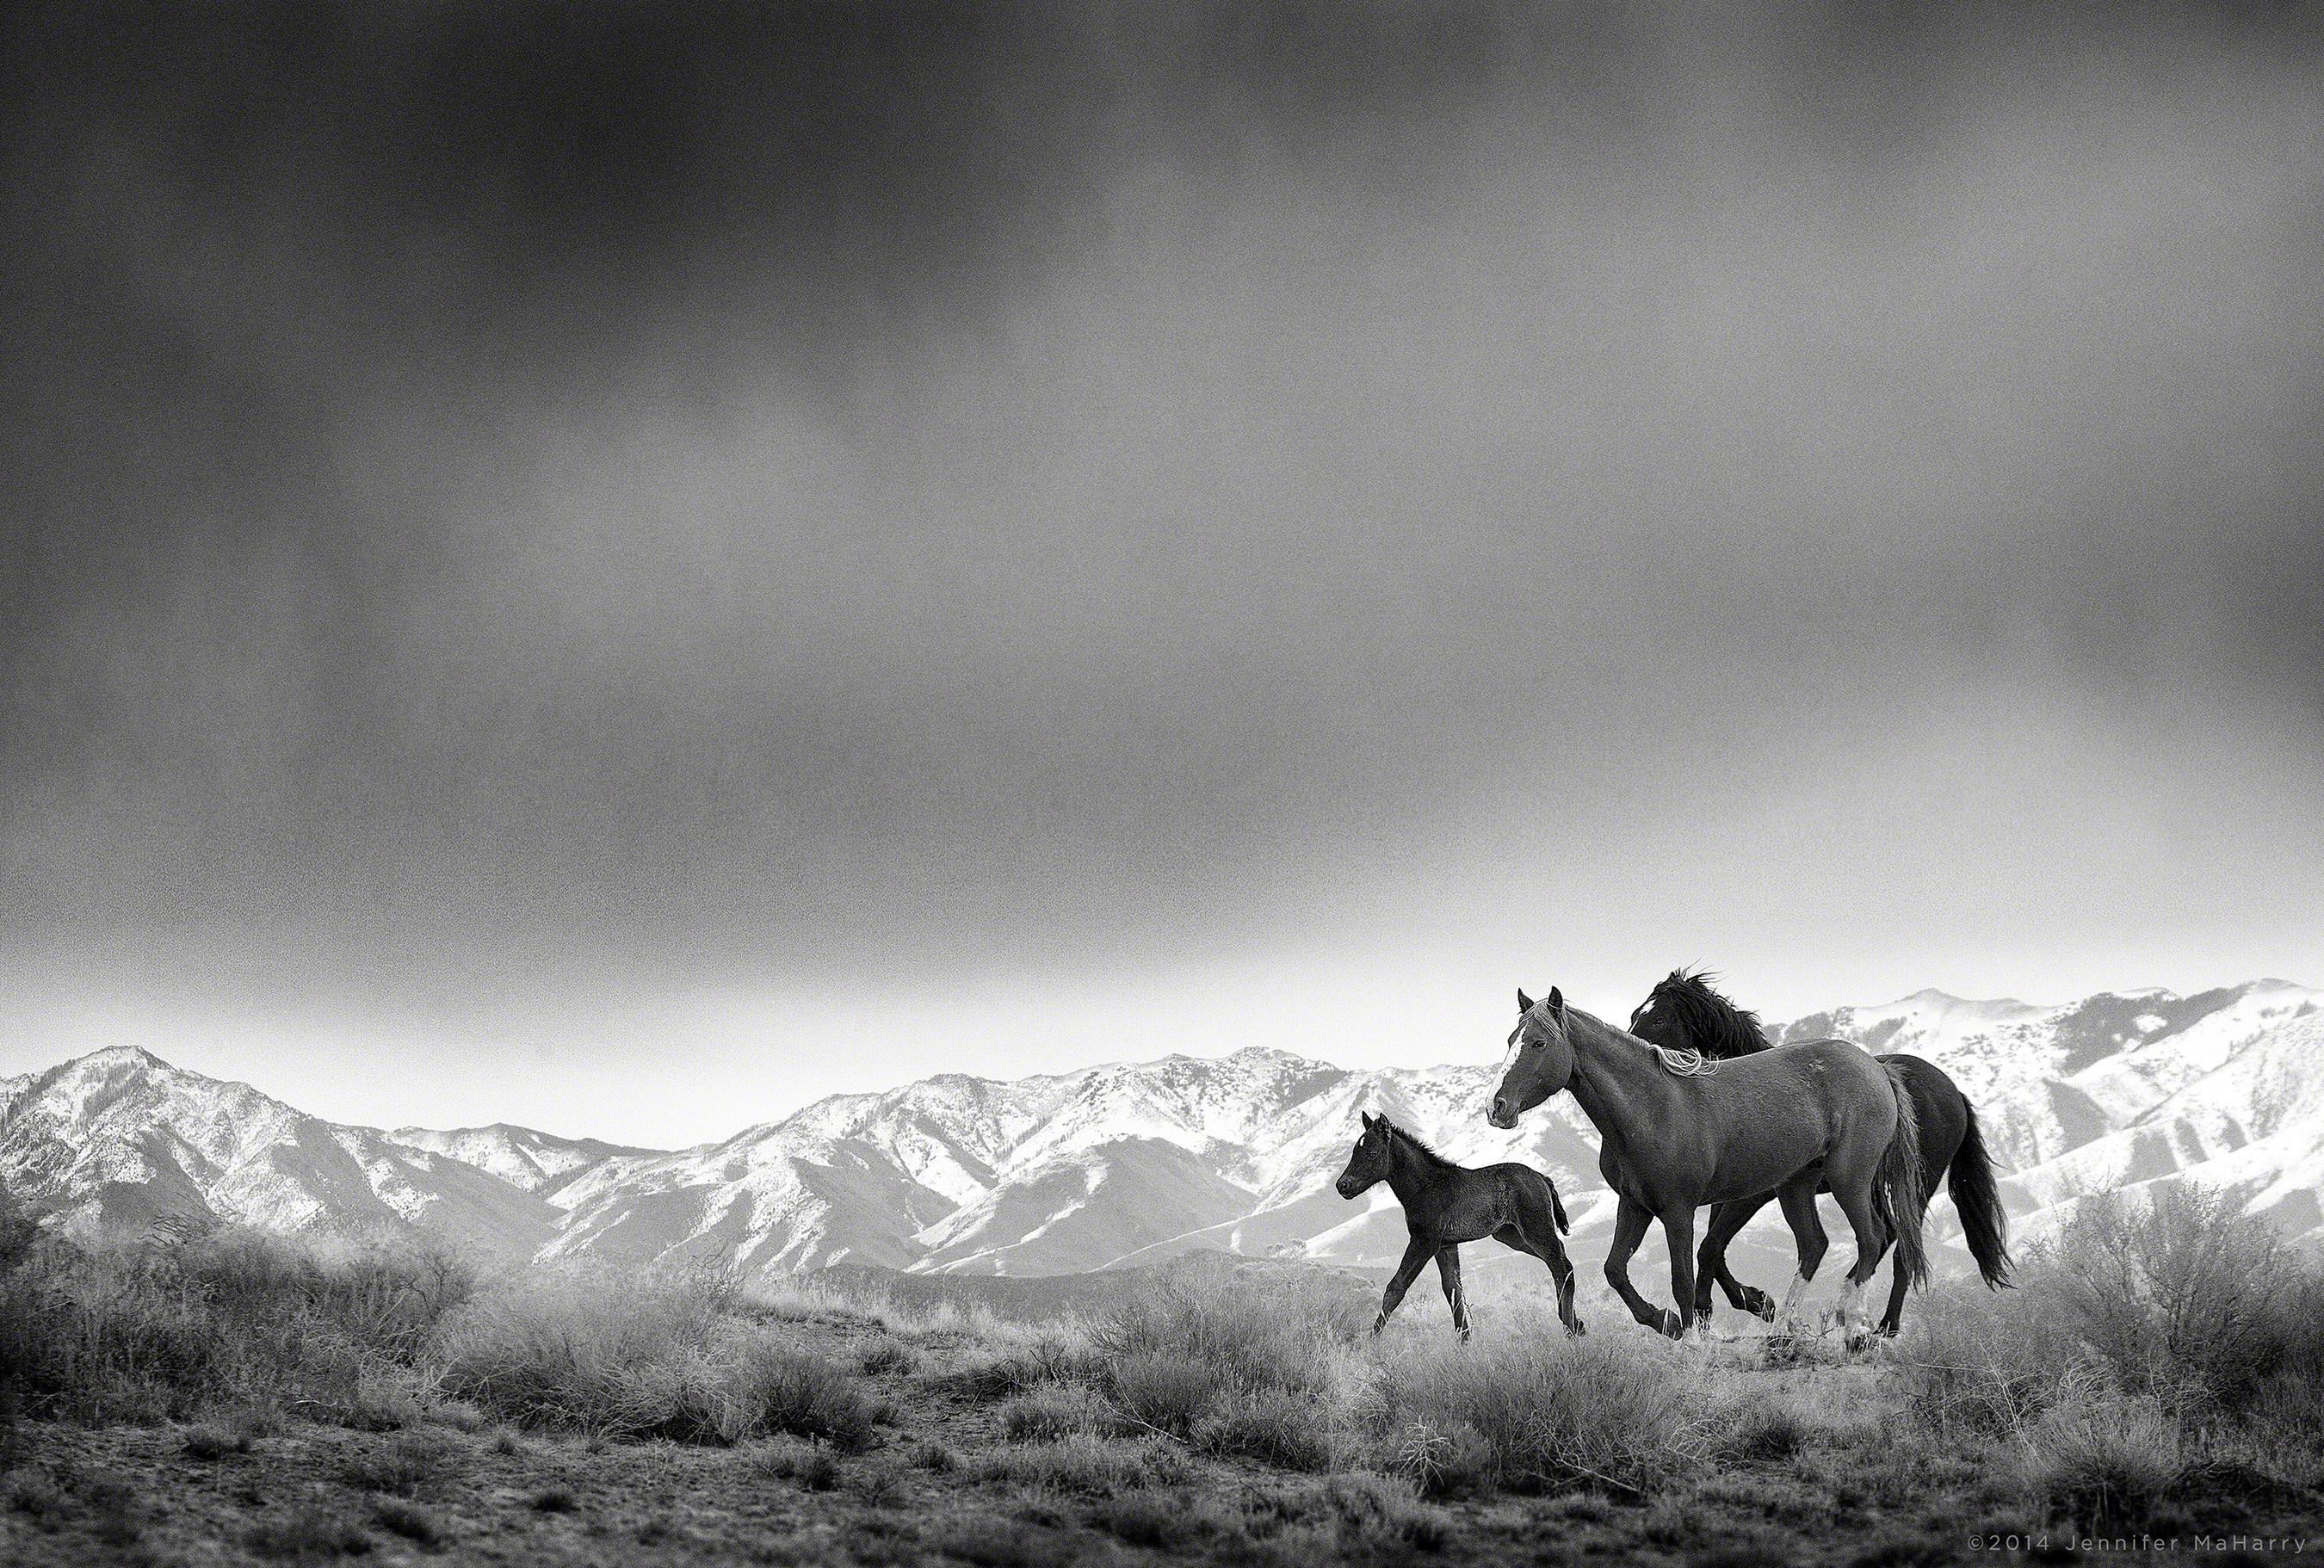 G2 Gallery Presents Wild Horses Exhibit, Thru 9/14